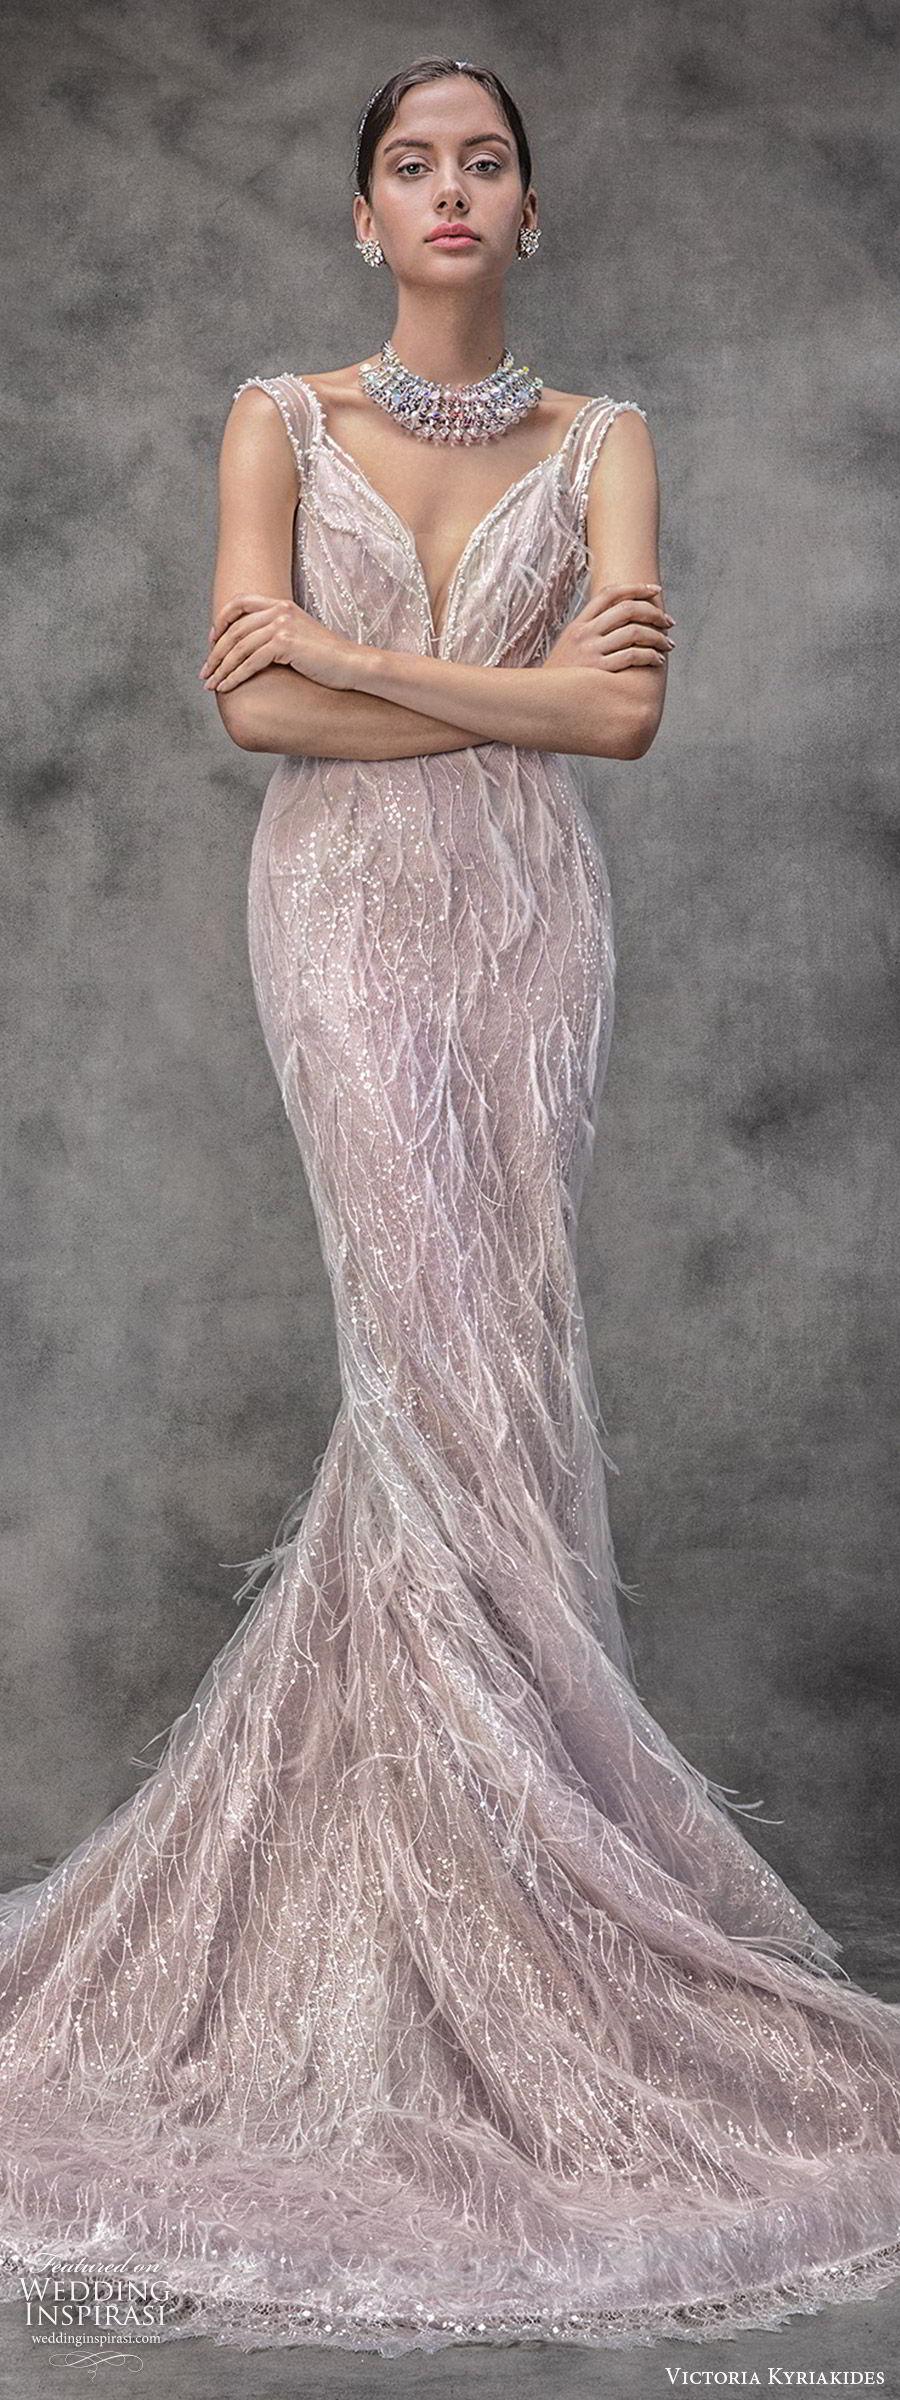 victoria kyriakides spring 2020 bridal sleevless sheer cap sleeves split sweetheart neckline fully embellished sheath wedding dress (12) glitzy glam blush pink chapel train mv